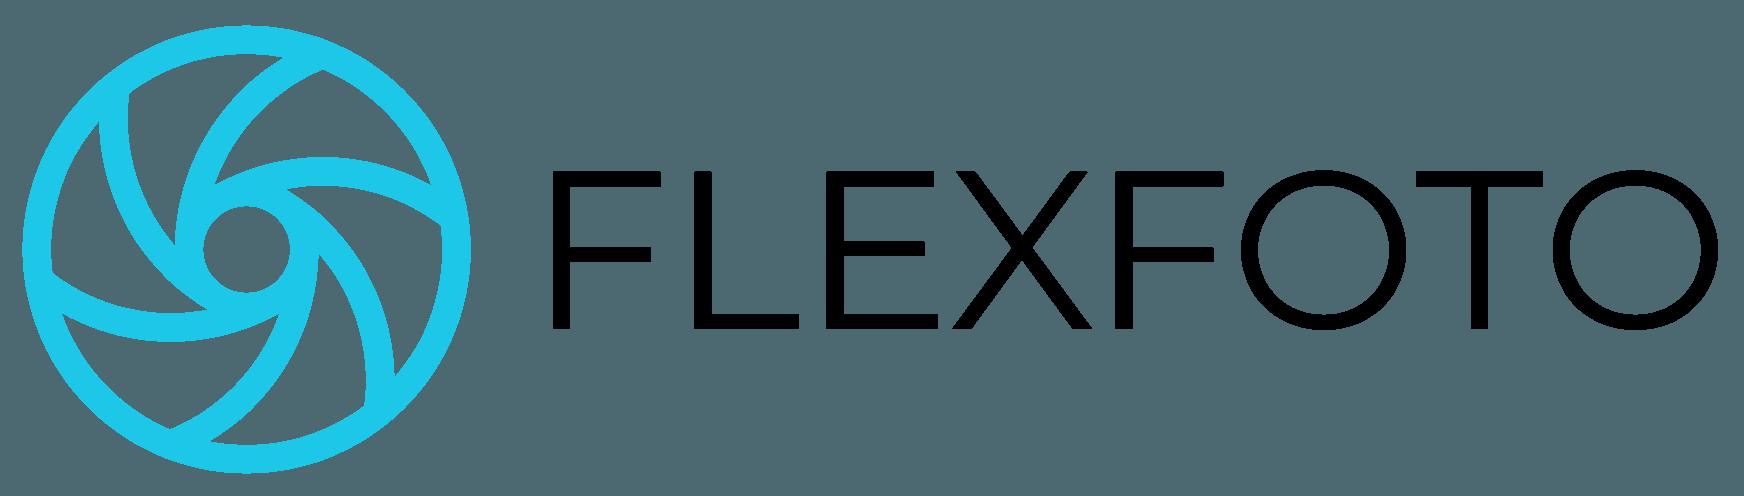 Flexfoto